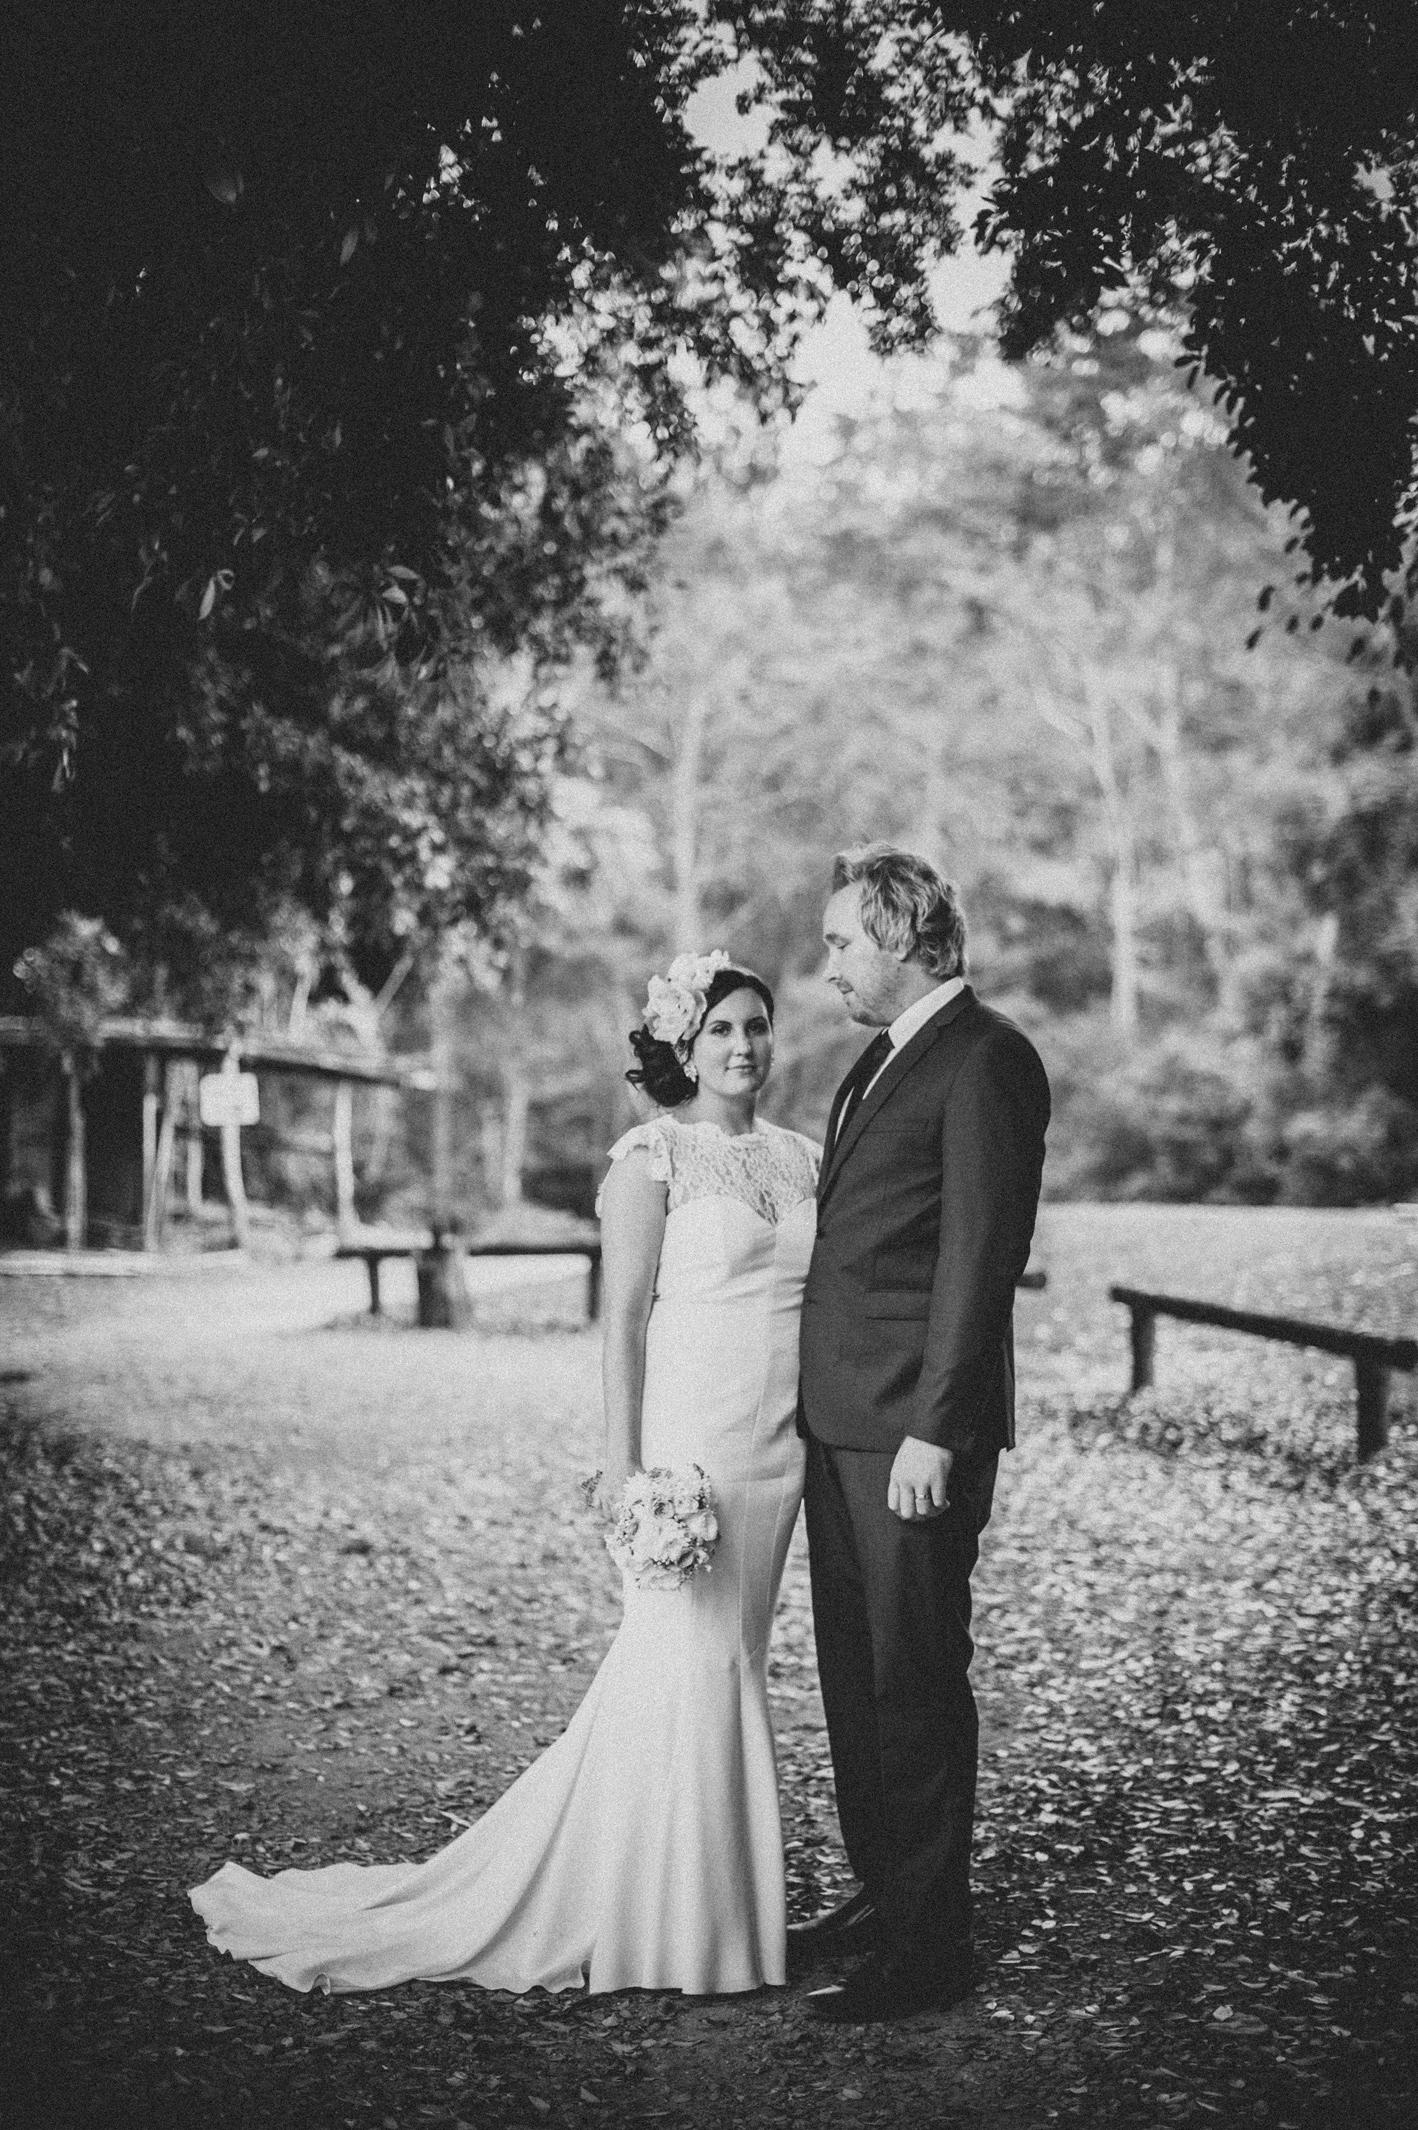 064-hannah-daniel-boomerang-farm-wedding-sophie-baker-photography